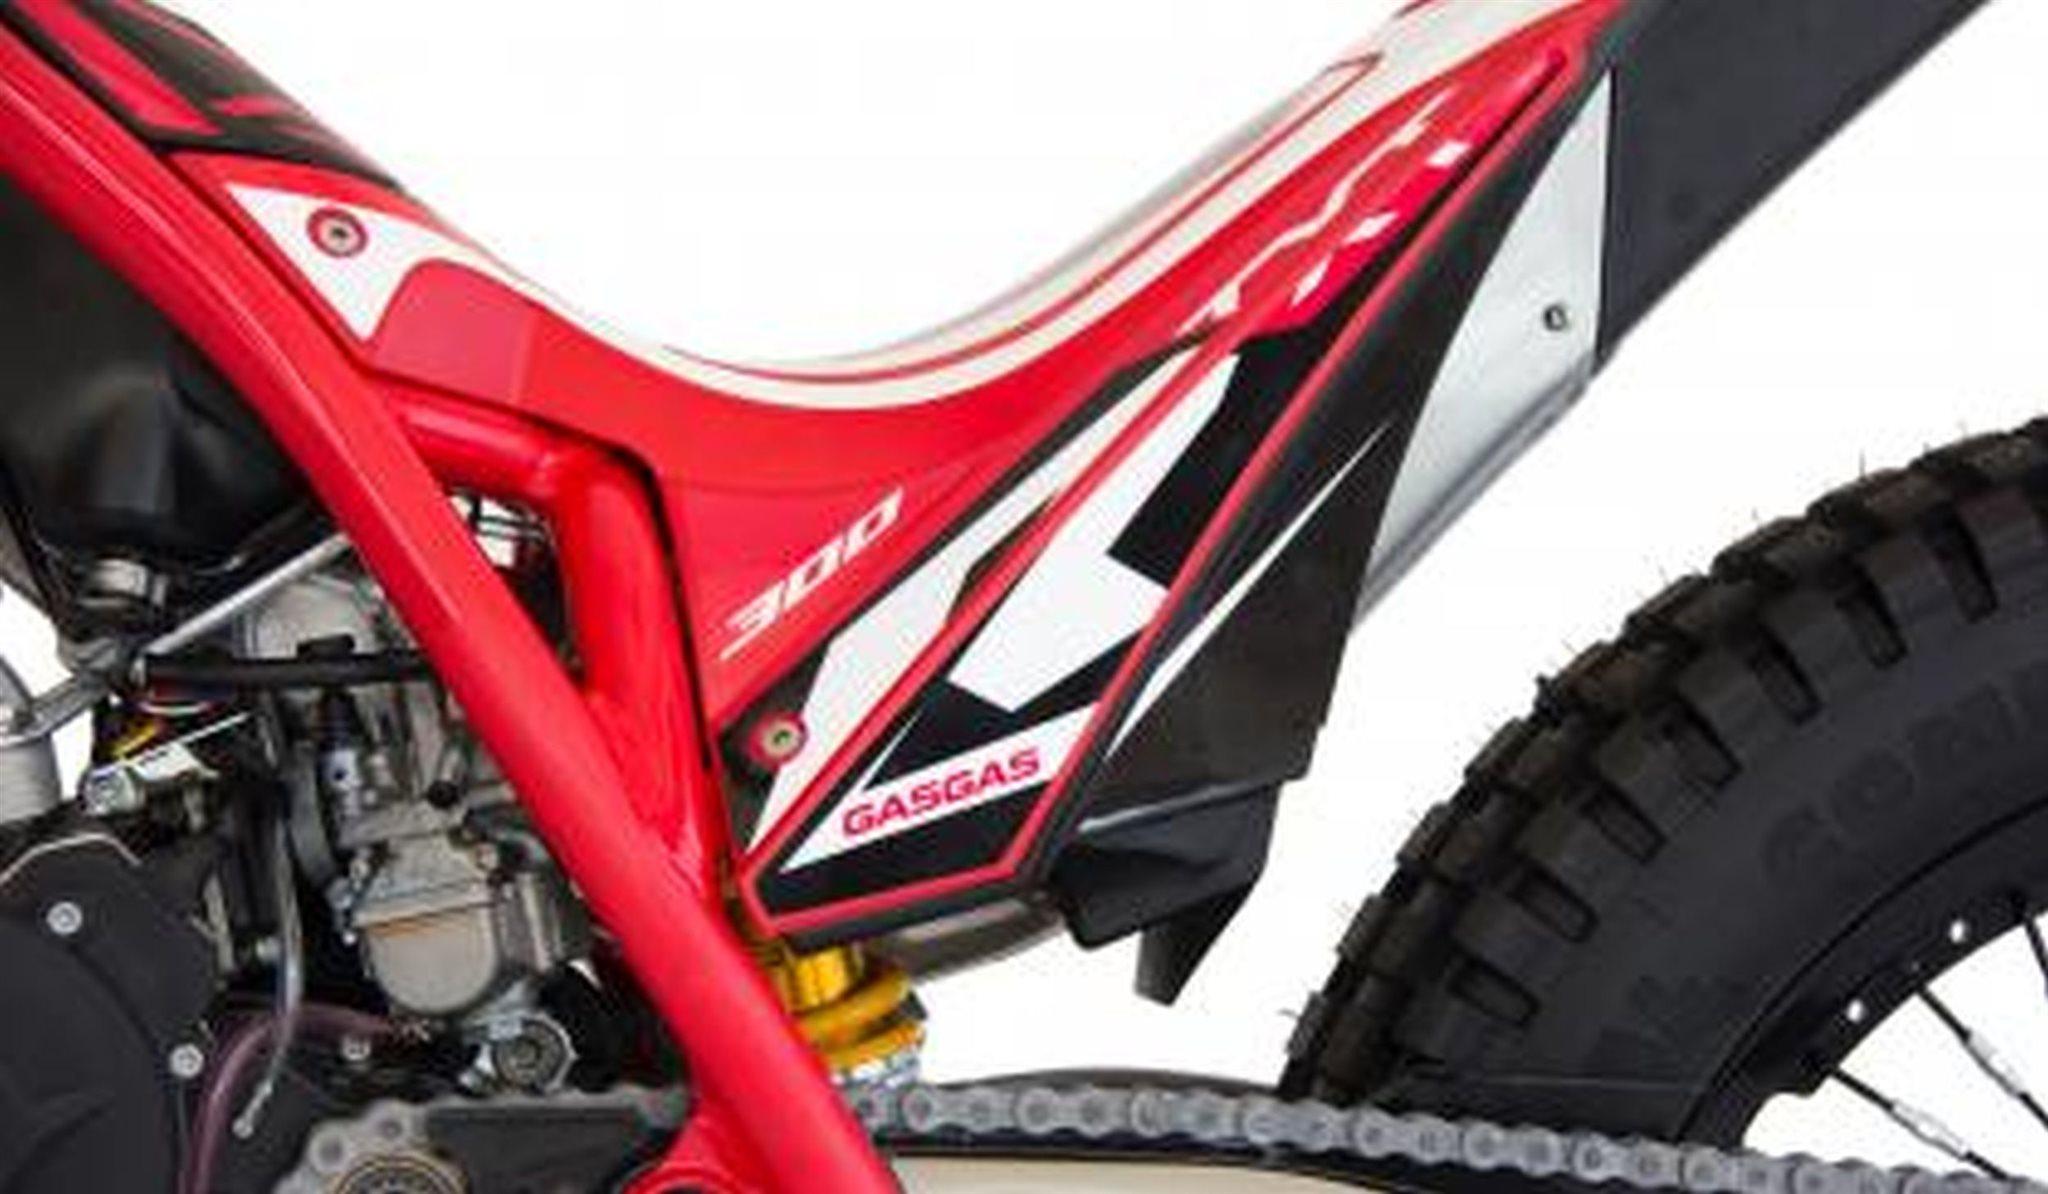 Gas Gas TXT Racing 125